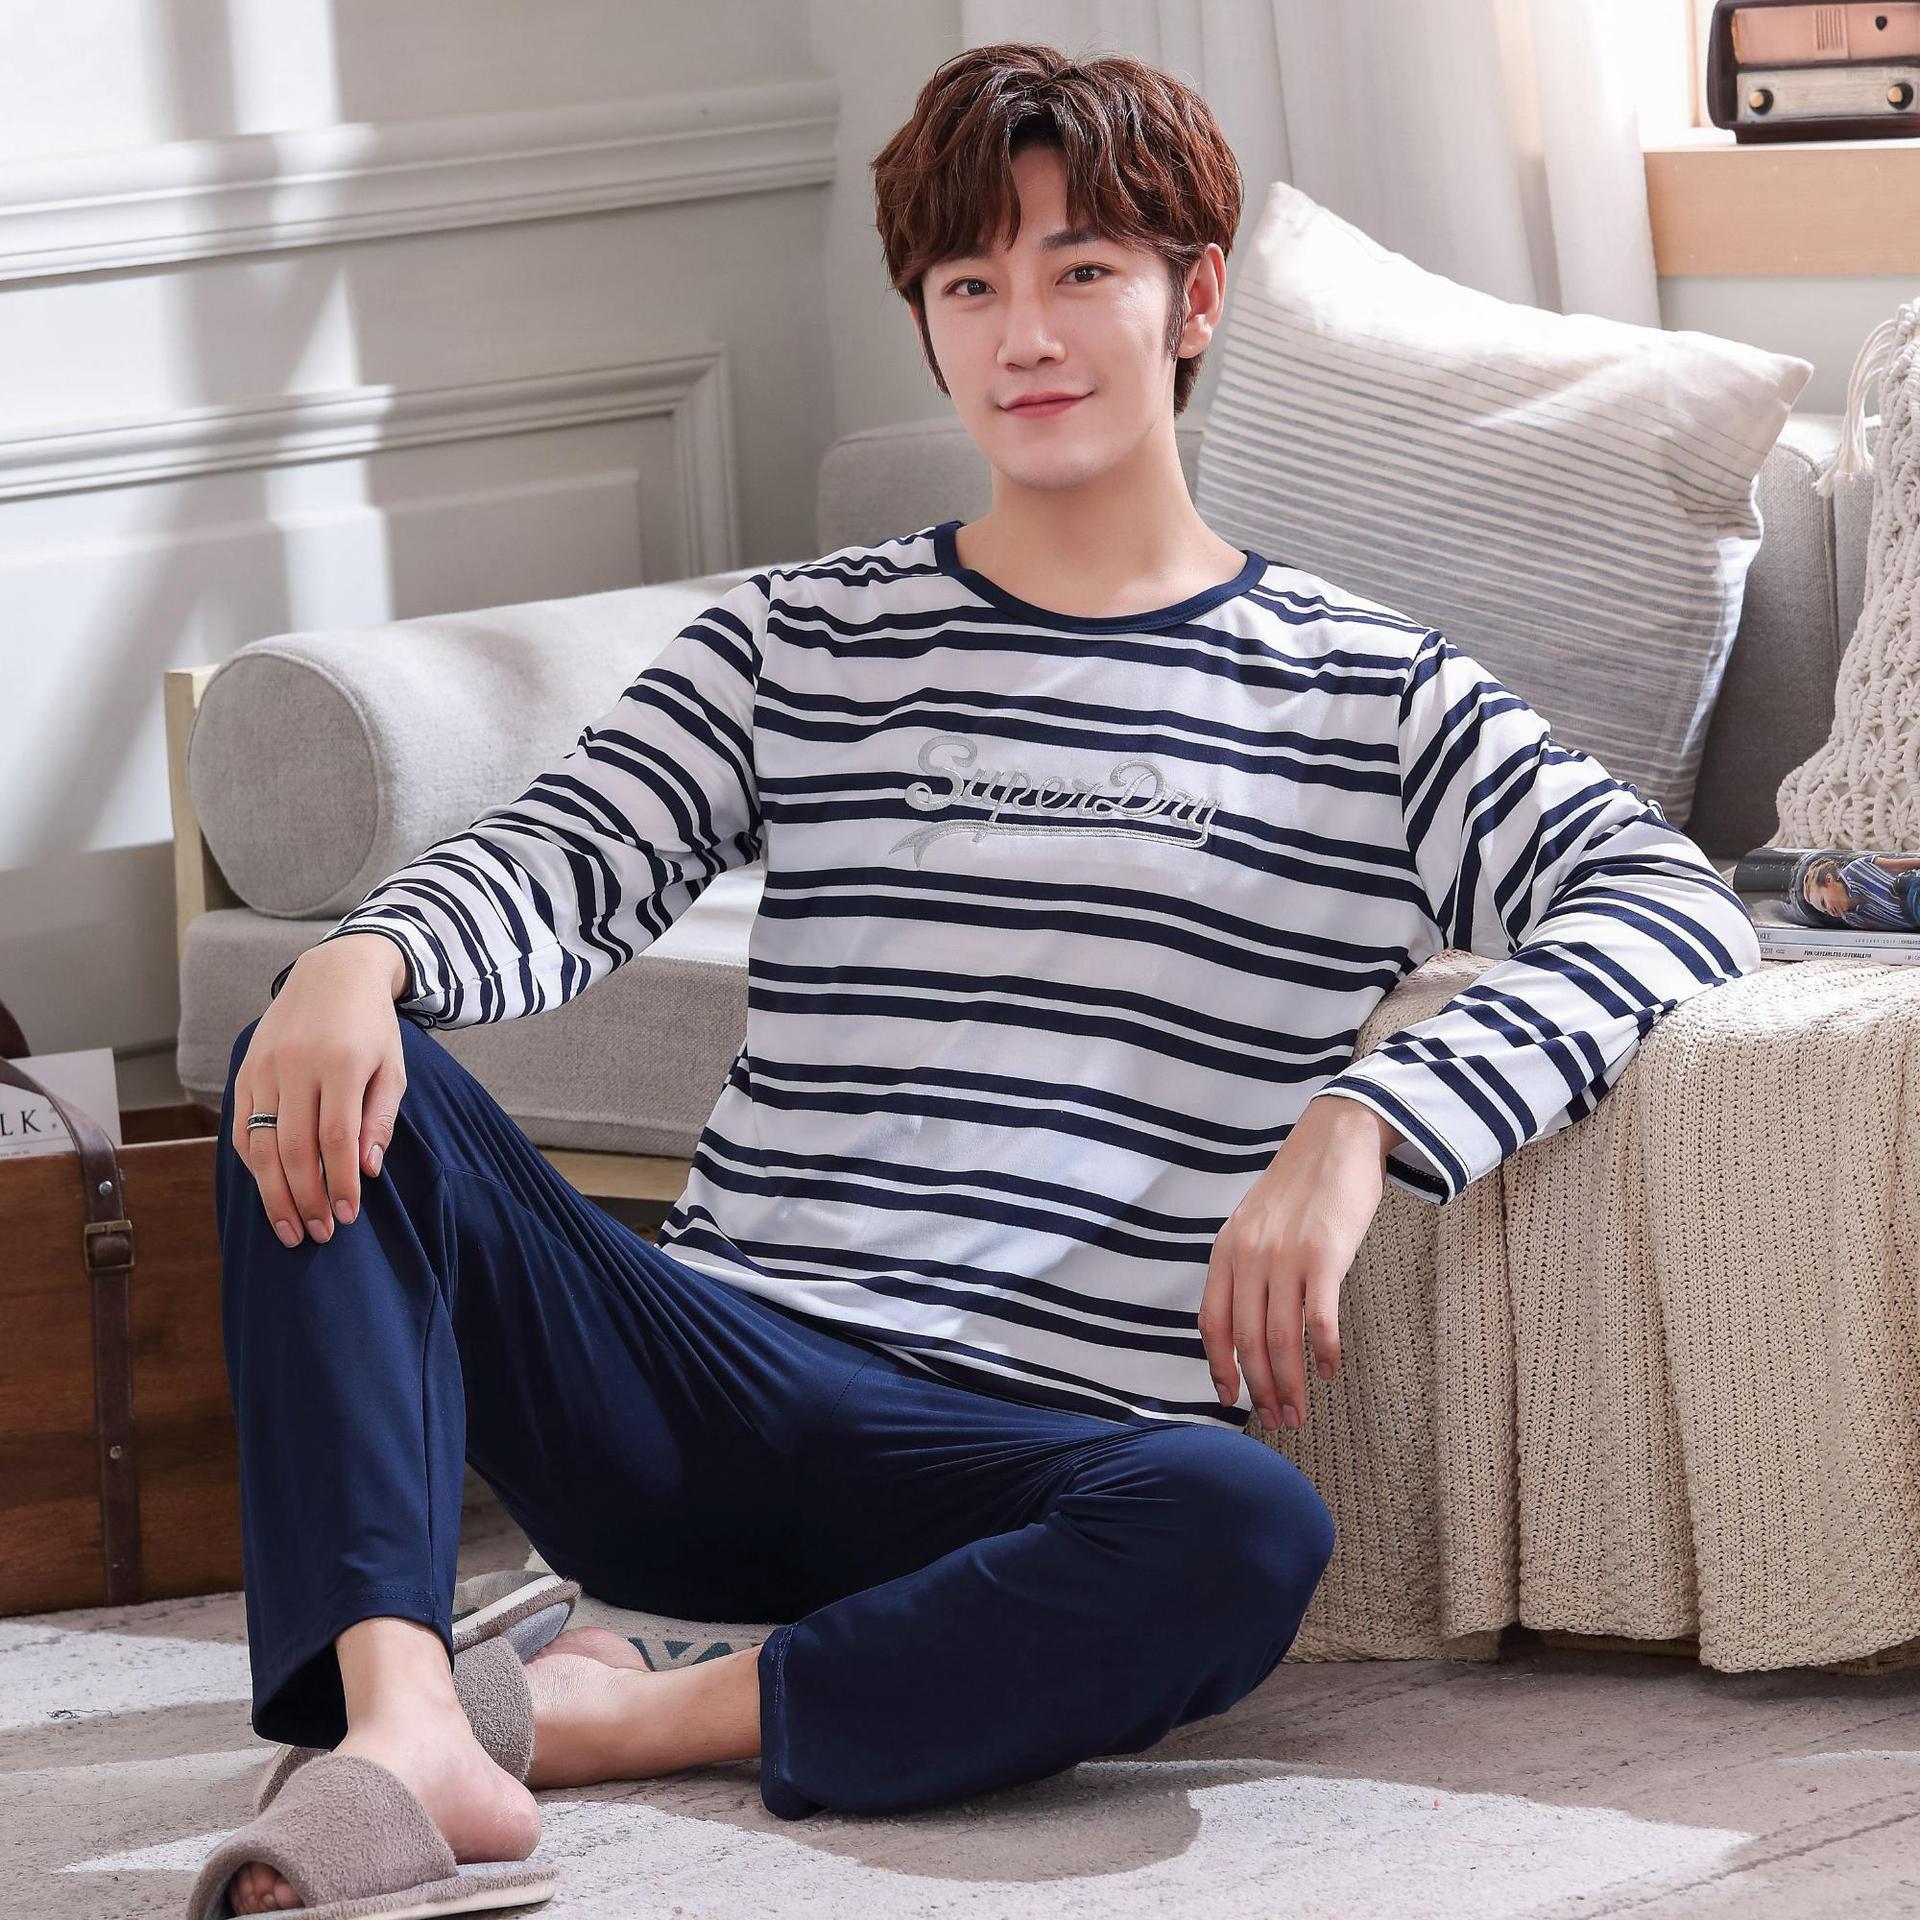 Men Pyjamas Suit Autumn New Long Sleeve Nightgown Stripe Pajamas Set For Male Plus Size Sleep Clothing Casual Nightie Sleepwear